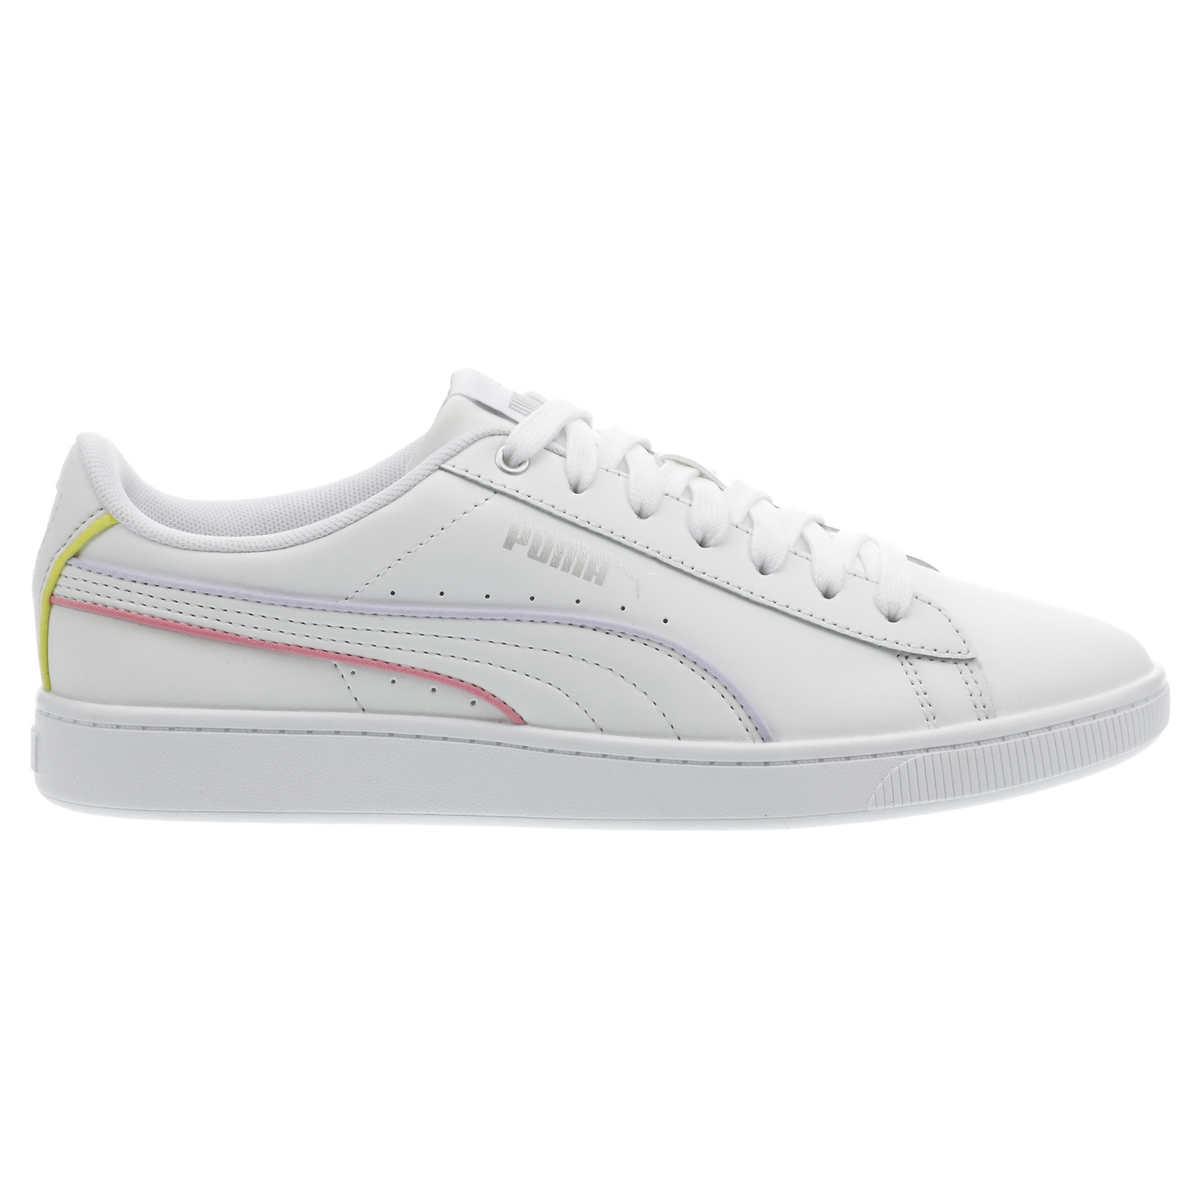 Vikky V2 Sneaker - Ladies Tennis Shoes